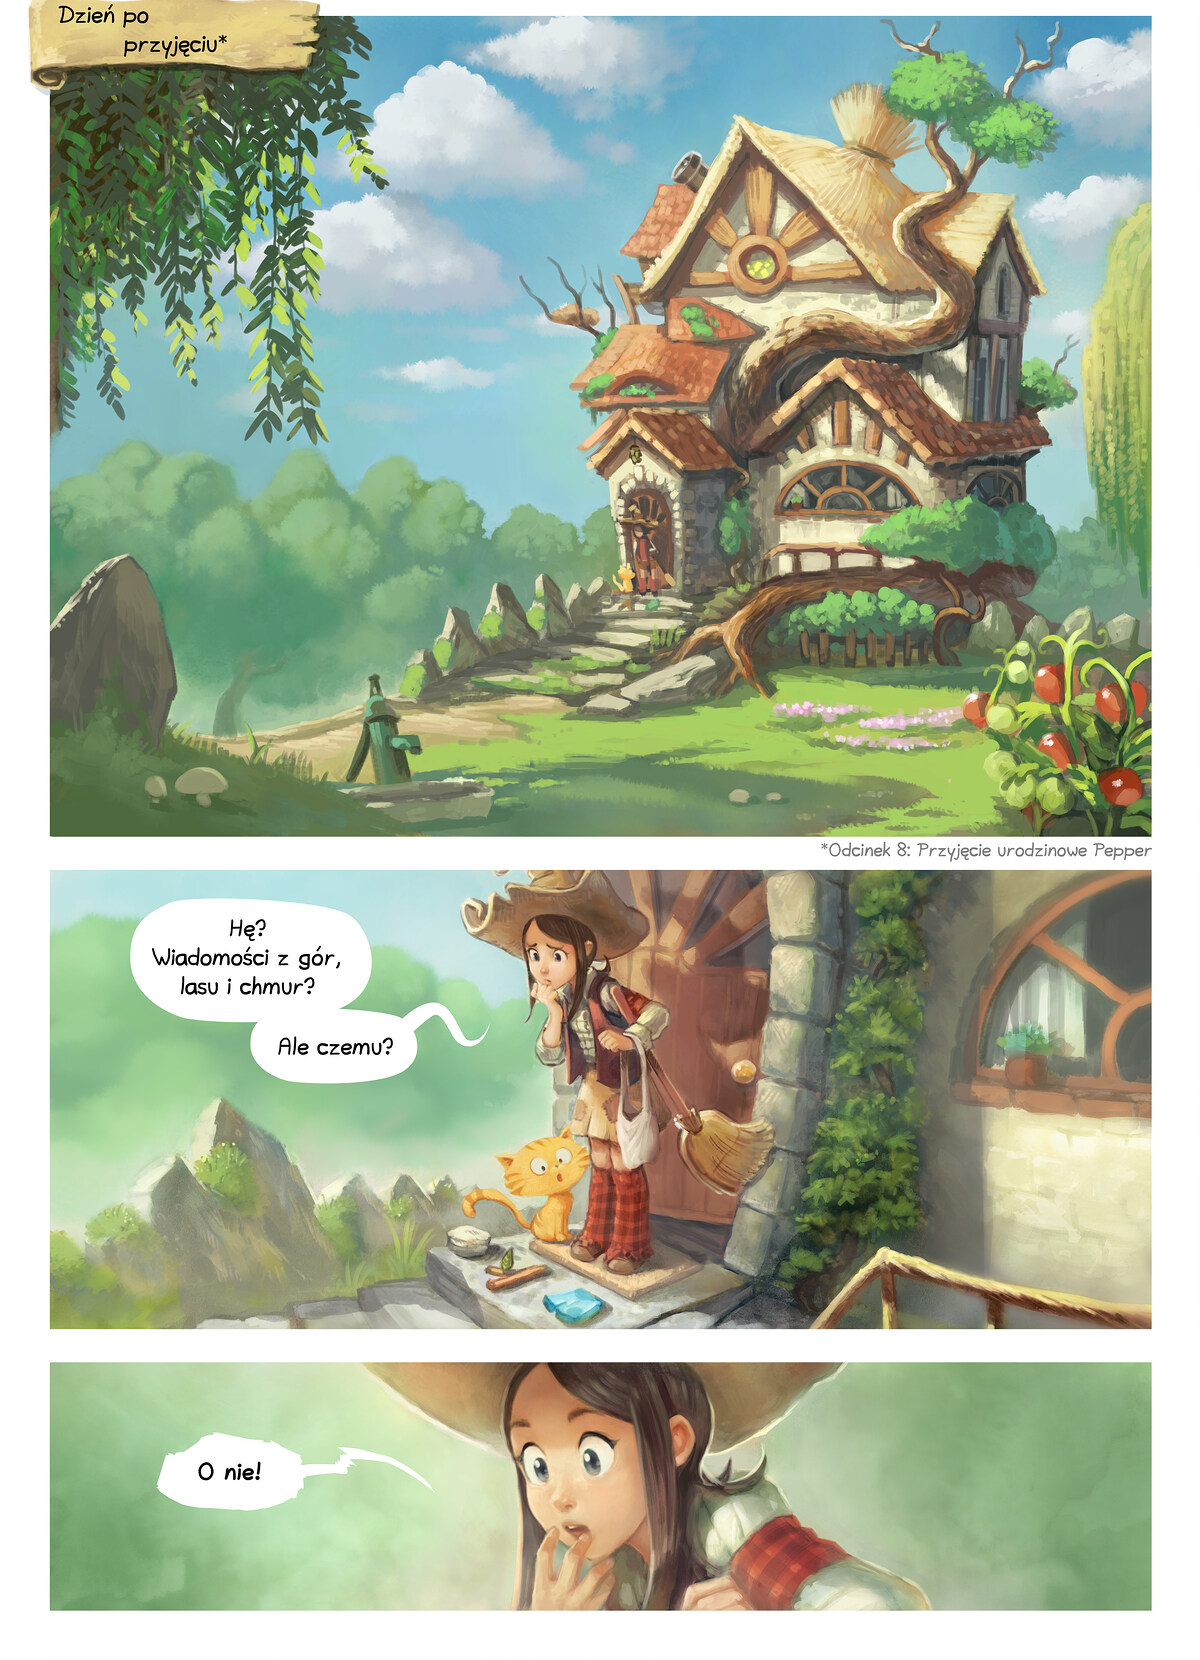 A webcomic page of Pepper&Carrot, odcinek 9 [pl], strona 1